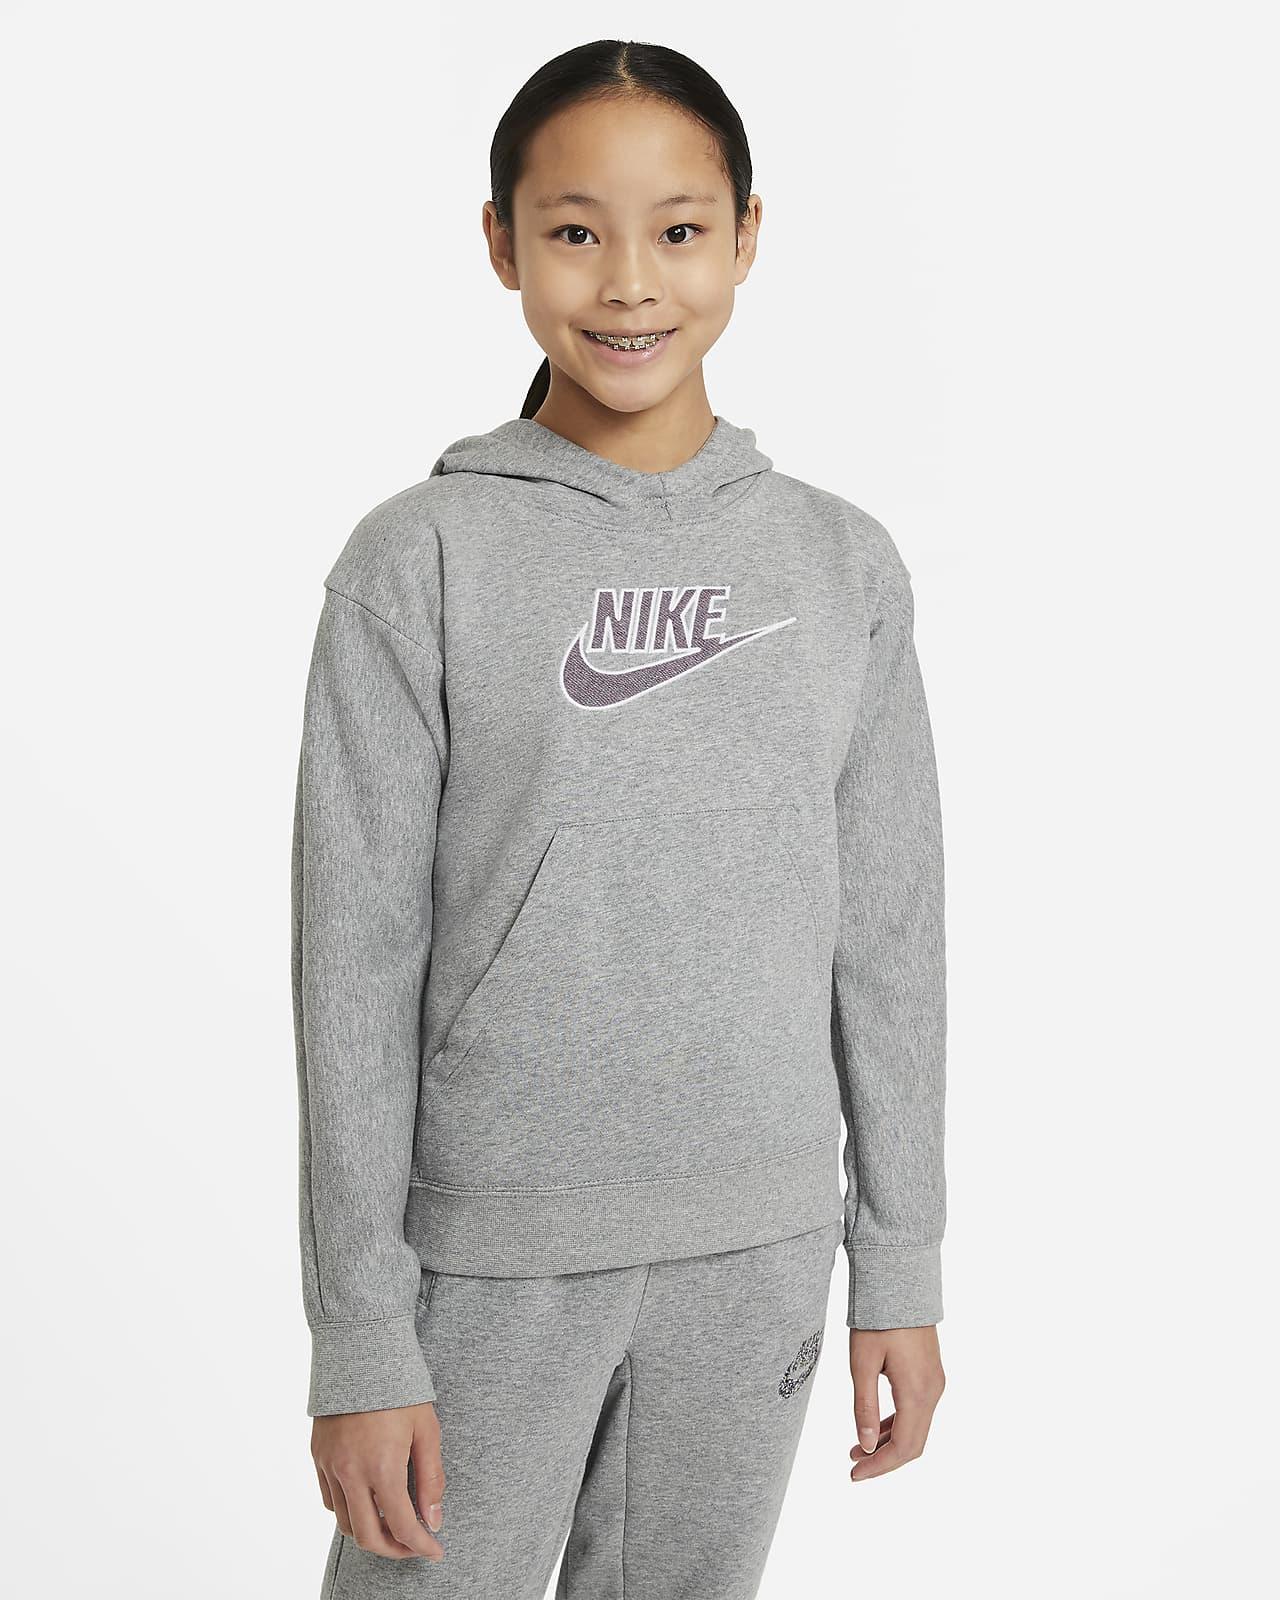 Huvtröja Nike Sportswear för ungdom